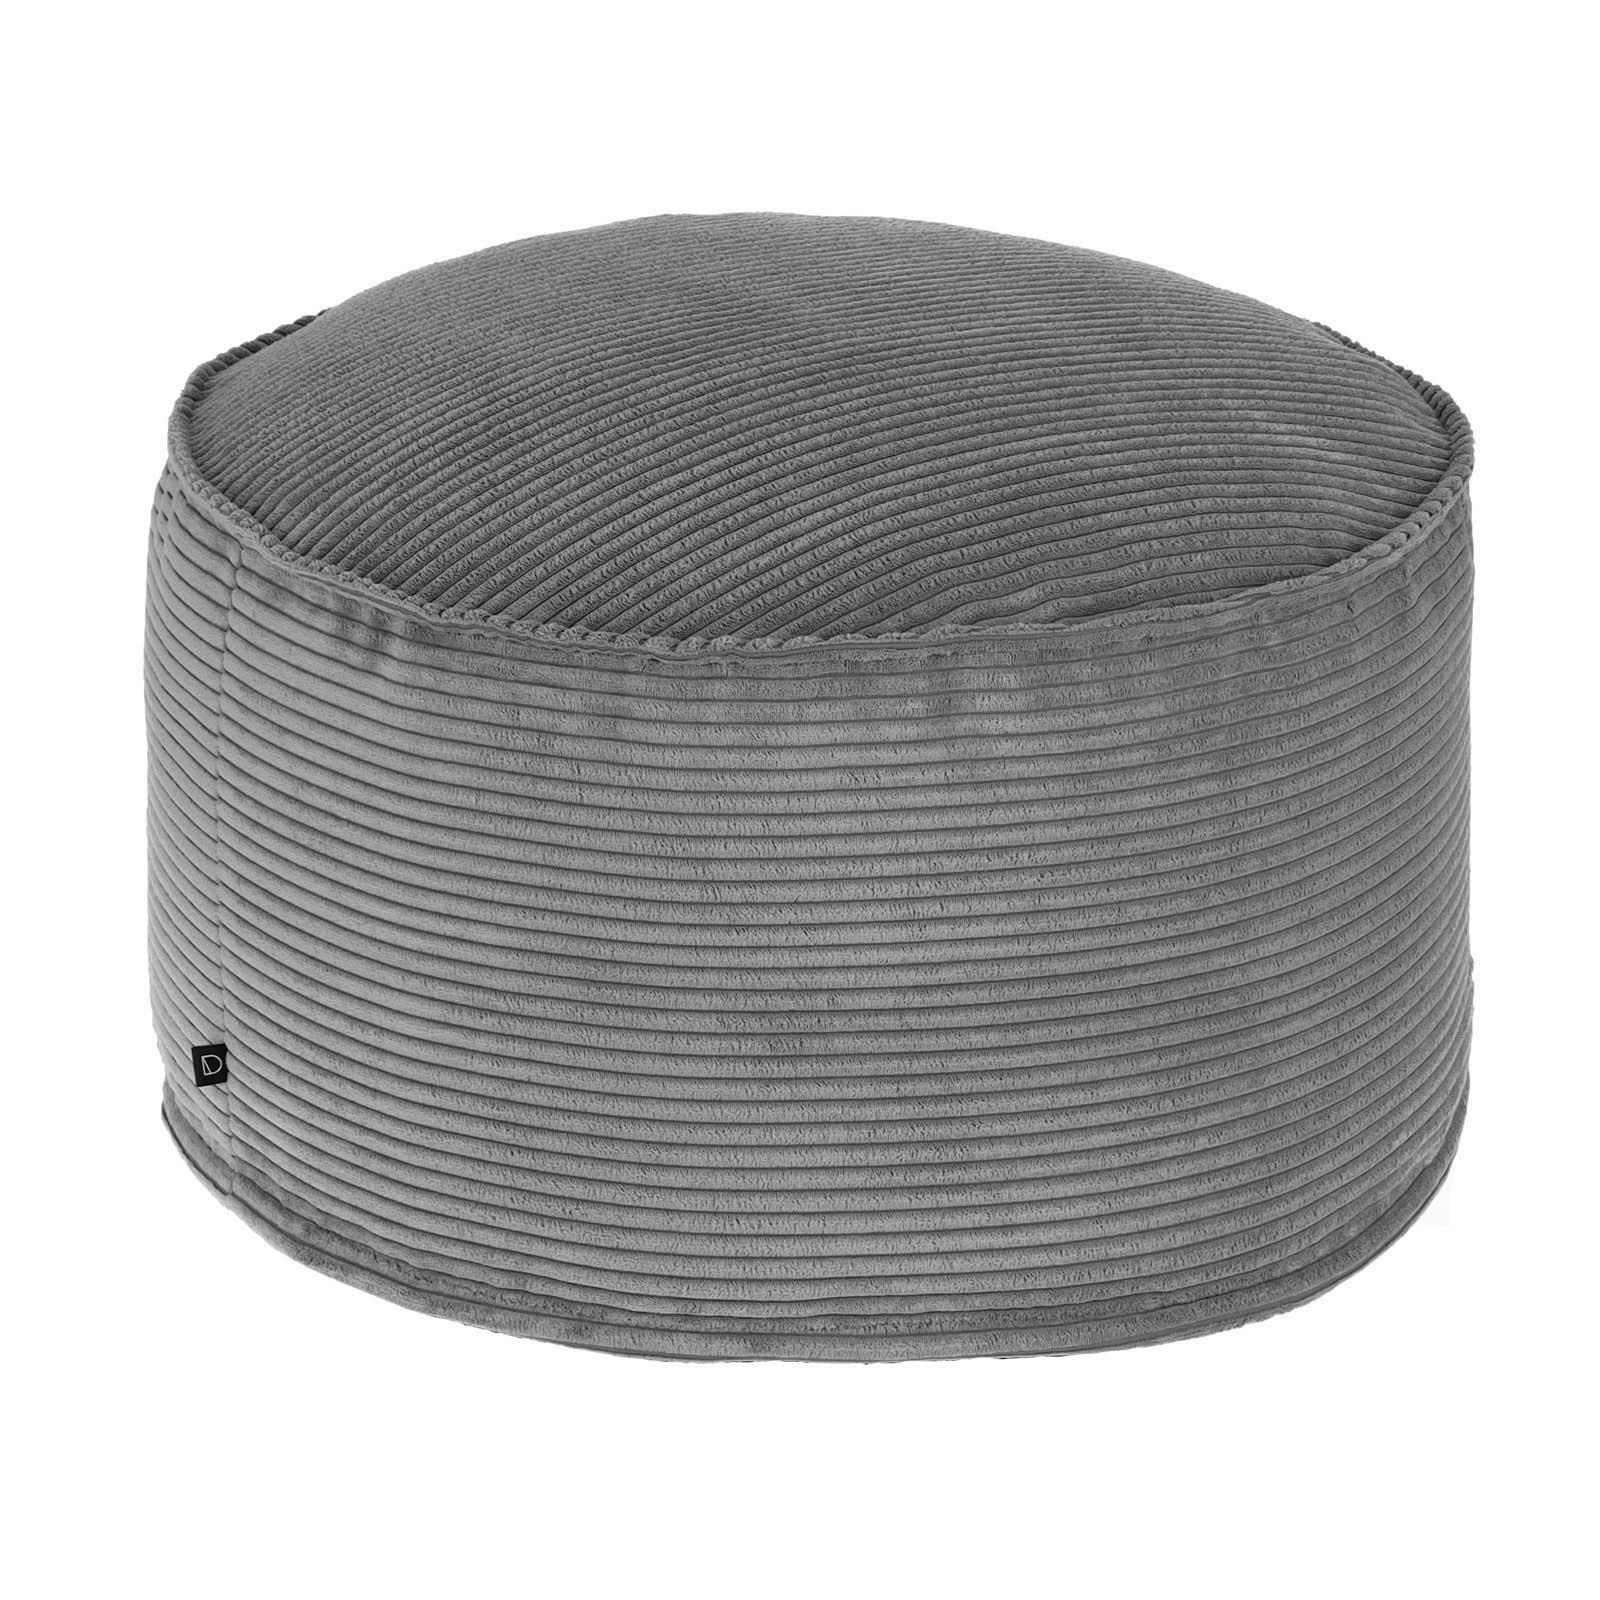 Lorton Corduroy Fabric Round Pouf, Dark Grey